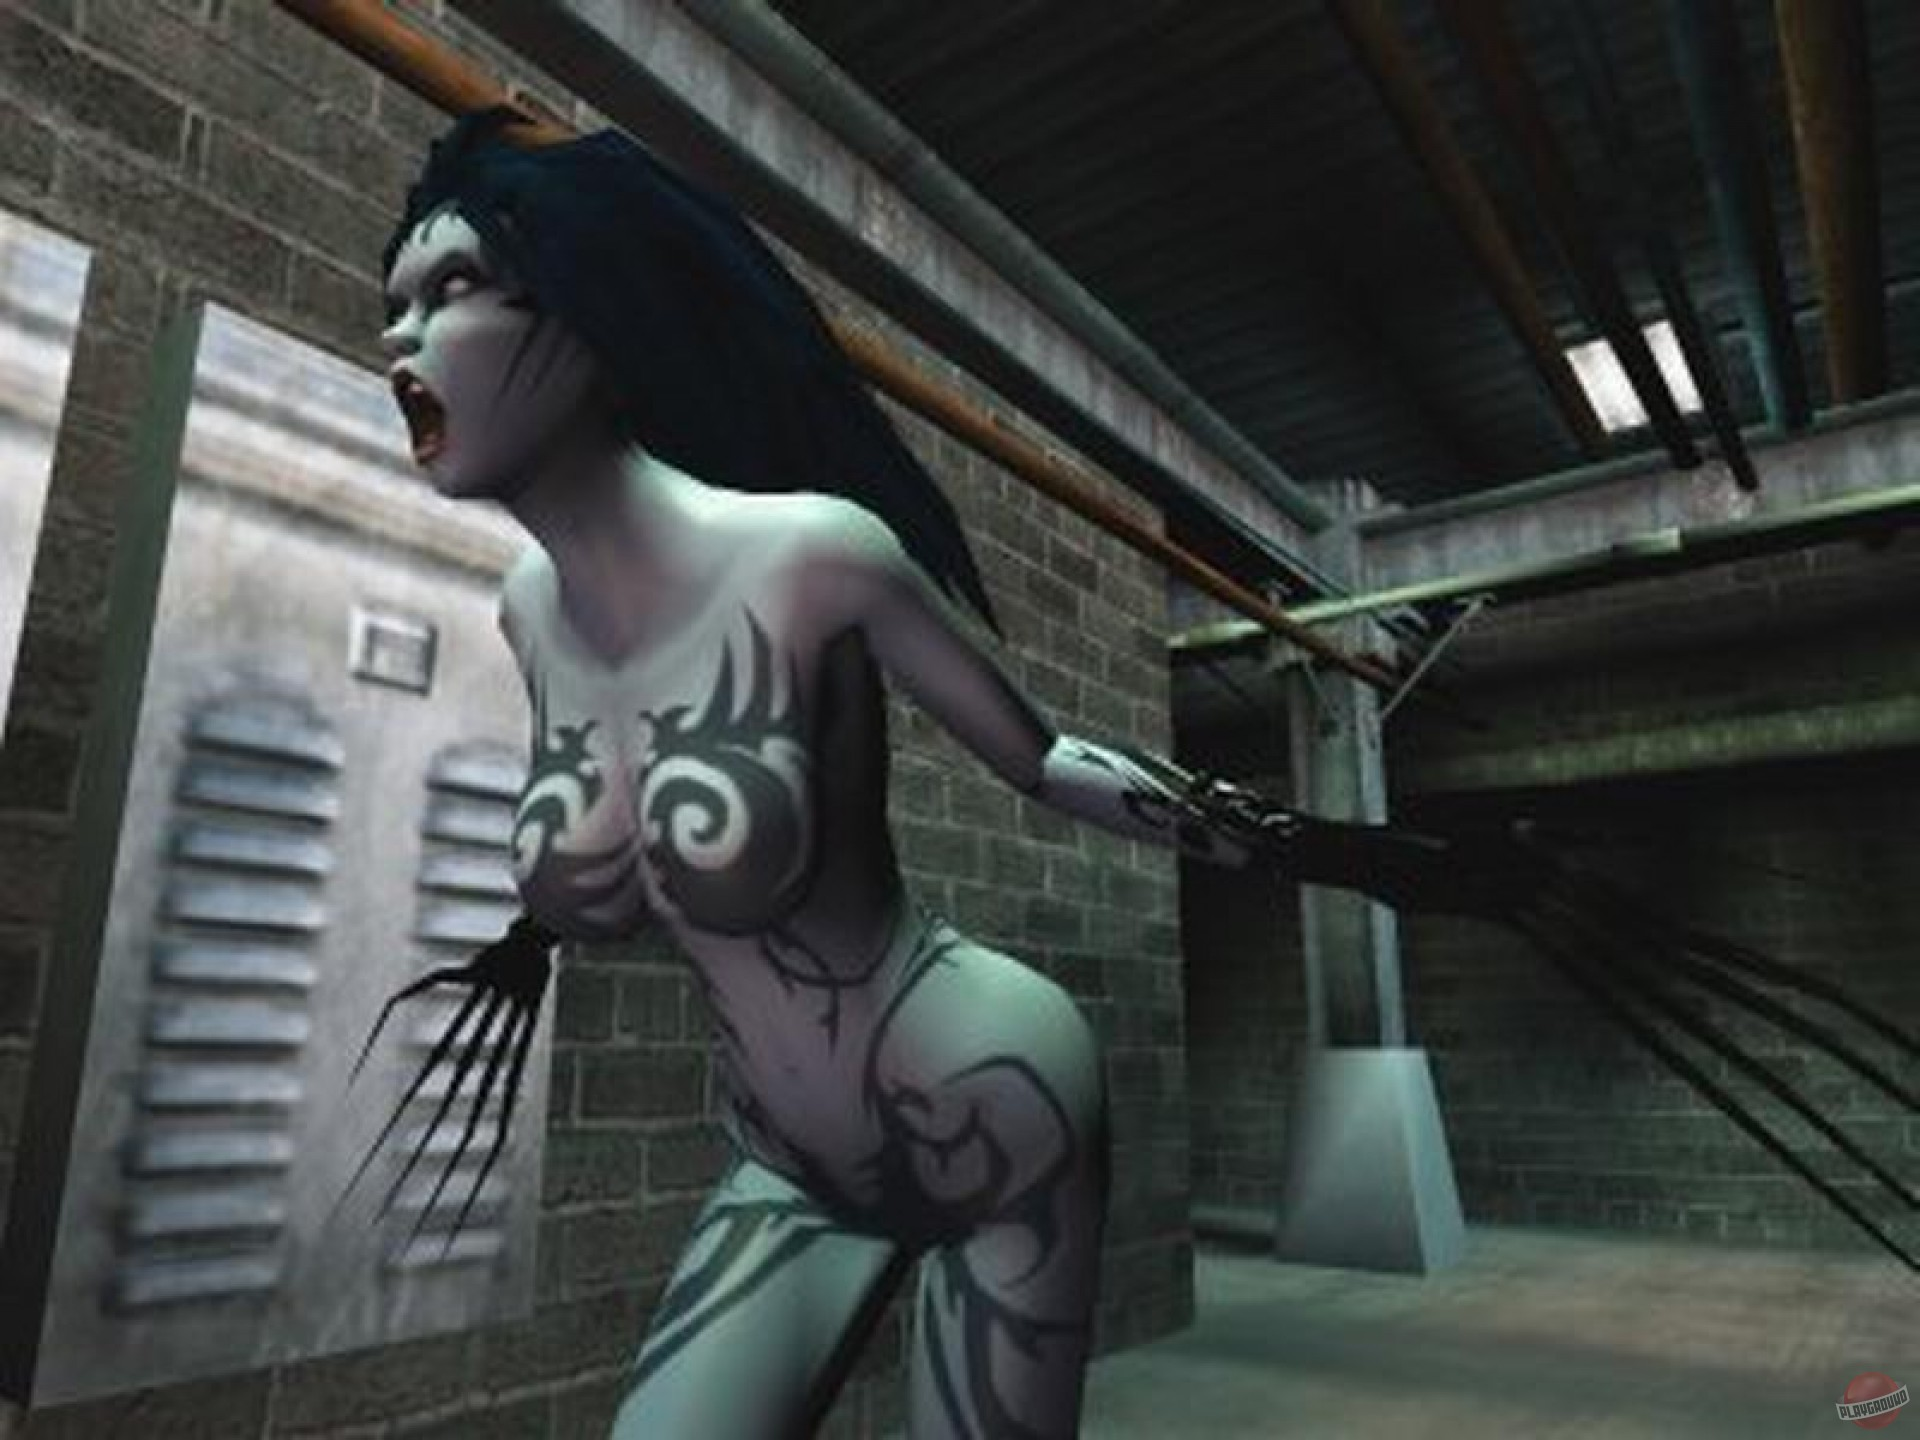 Bloodrayne titfuck erotica images